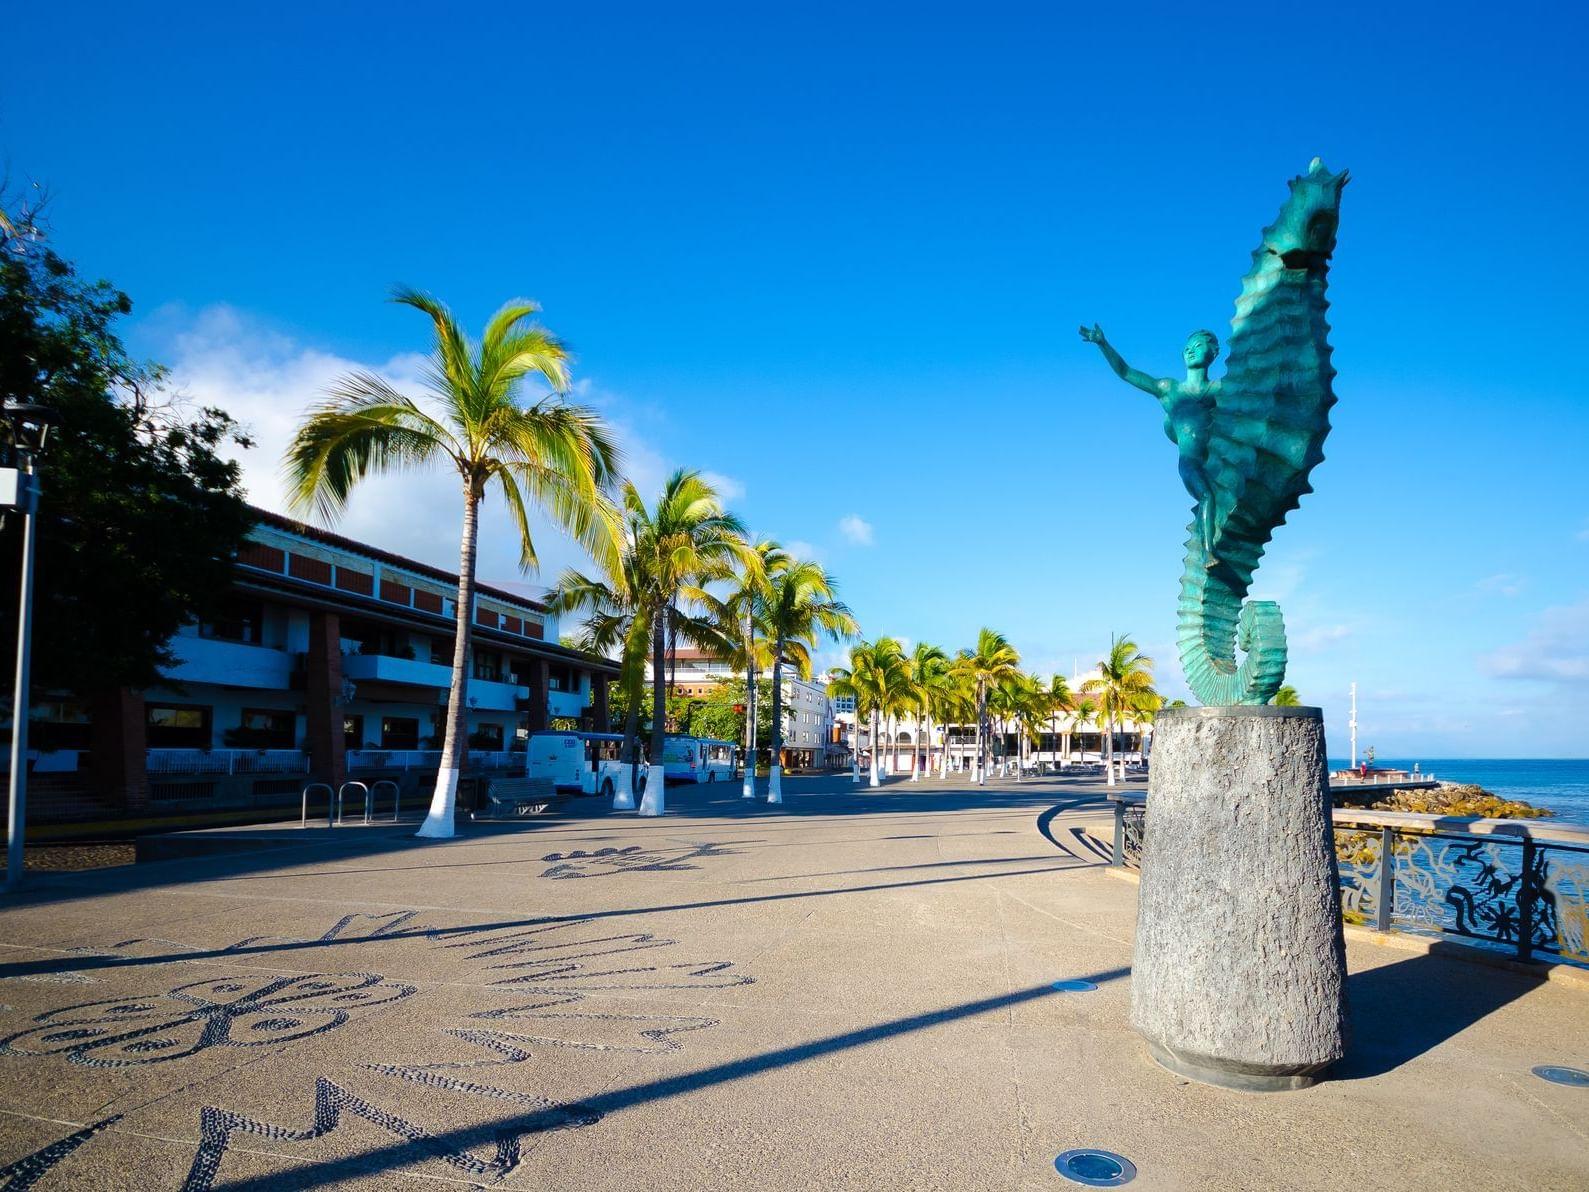 a seahorse statue